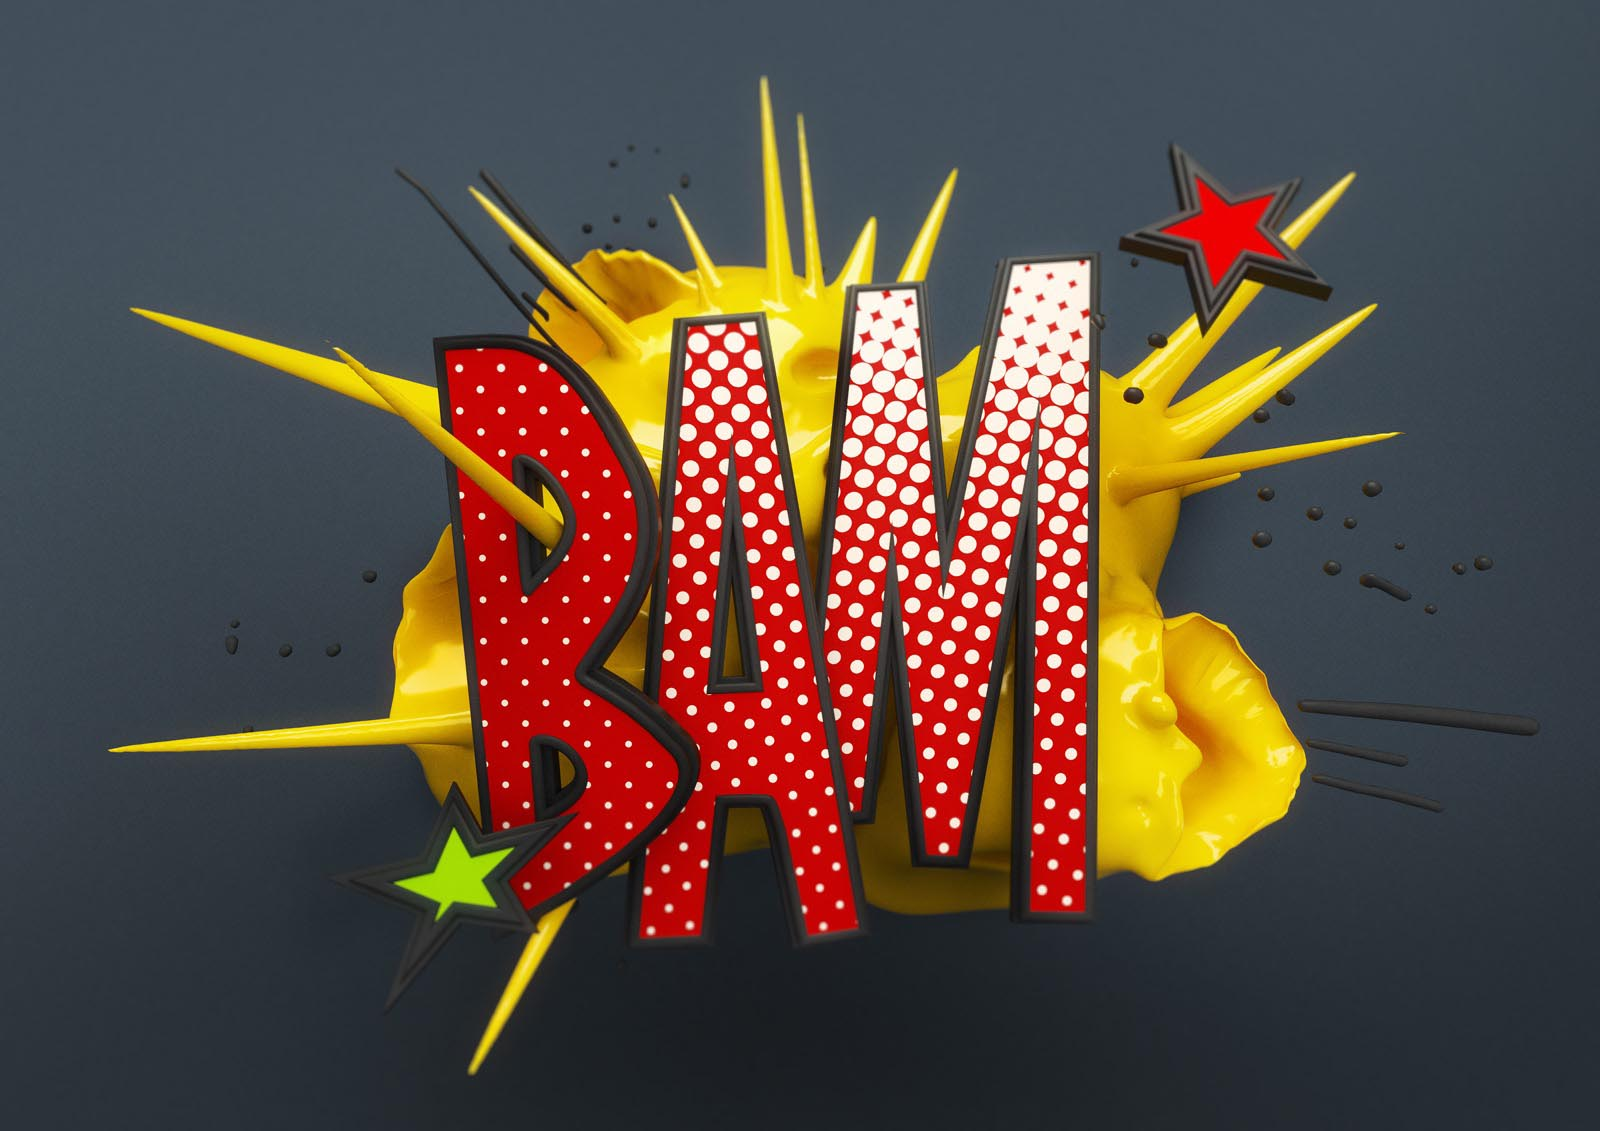 Onomatopoeia bam comic cartoon typo typography font slang 3D explosion